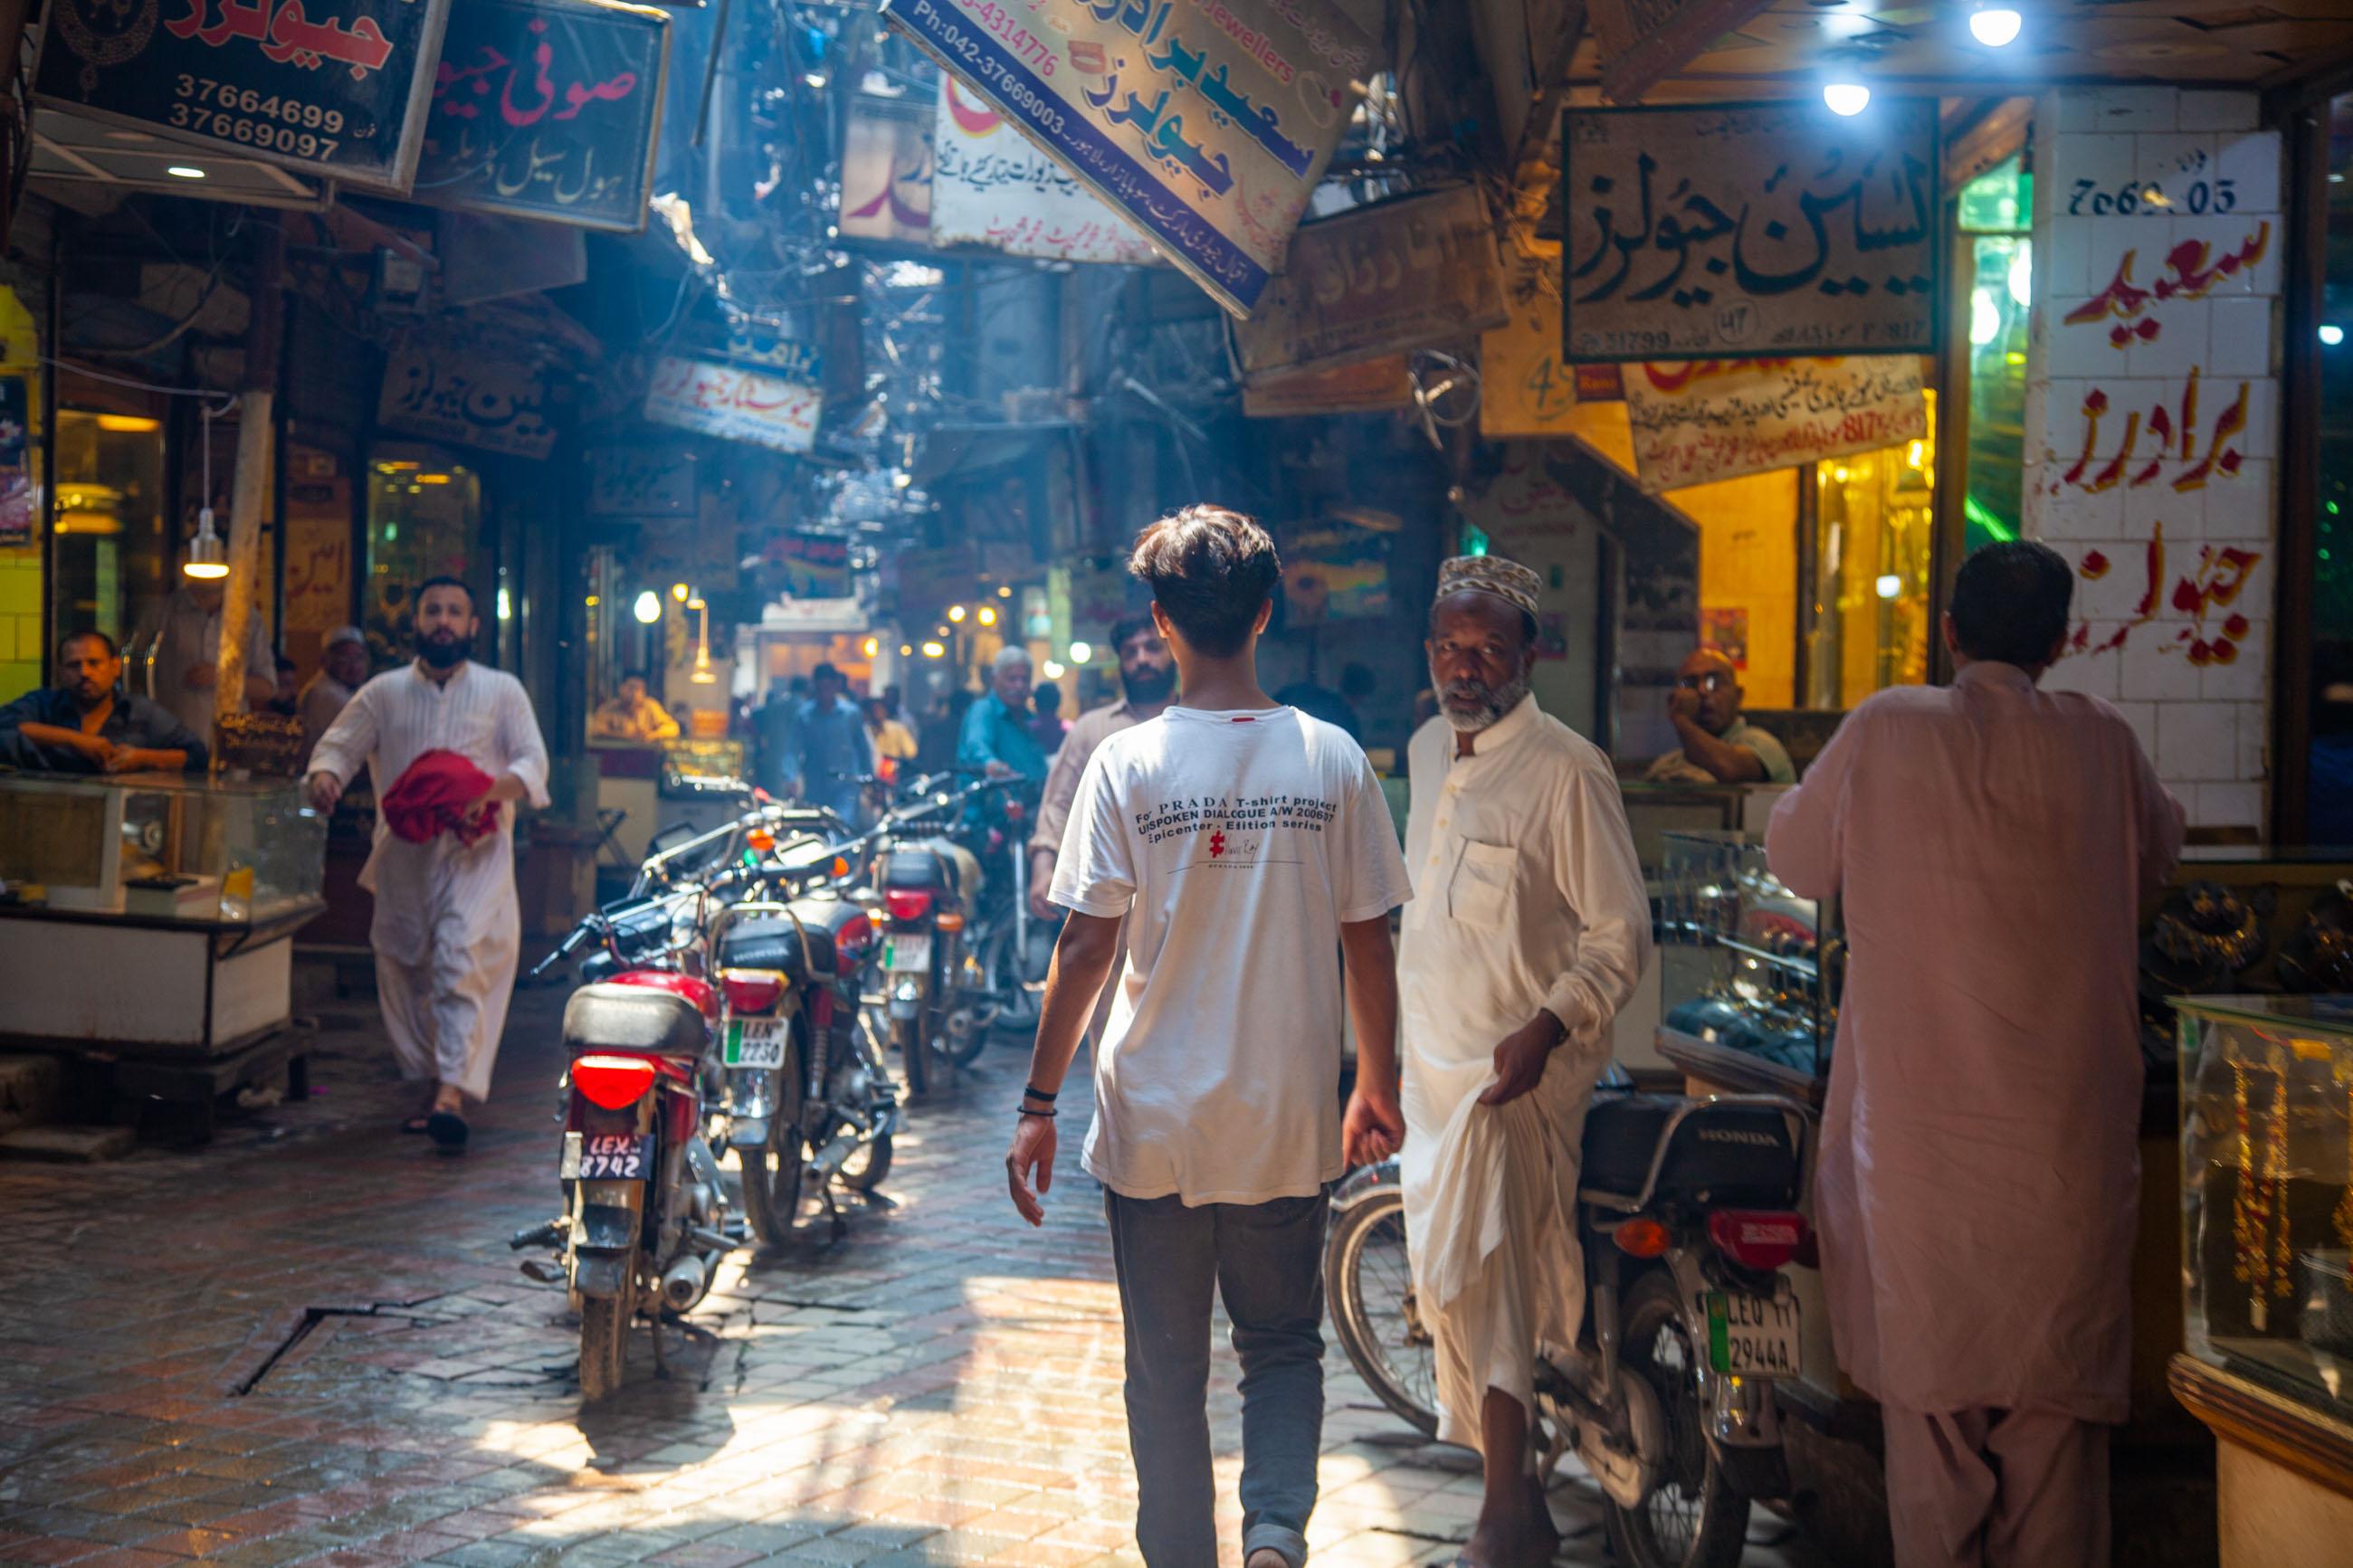 https://bubo.sk/uploads/galleries/4920/samuelklc_pakistan_peshawar_lahore_img_0151.jpg